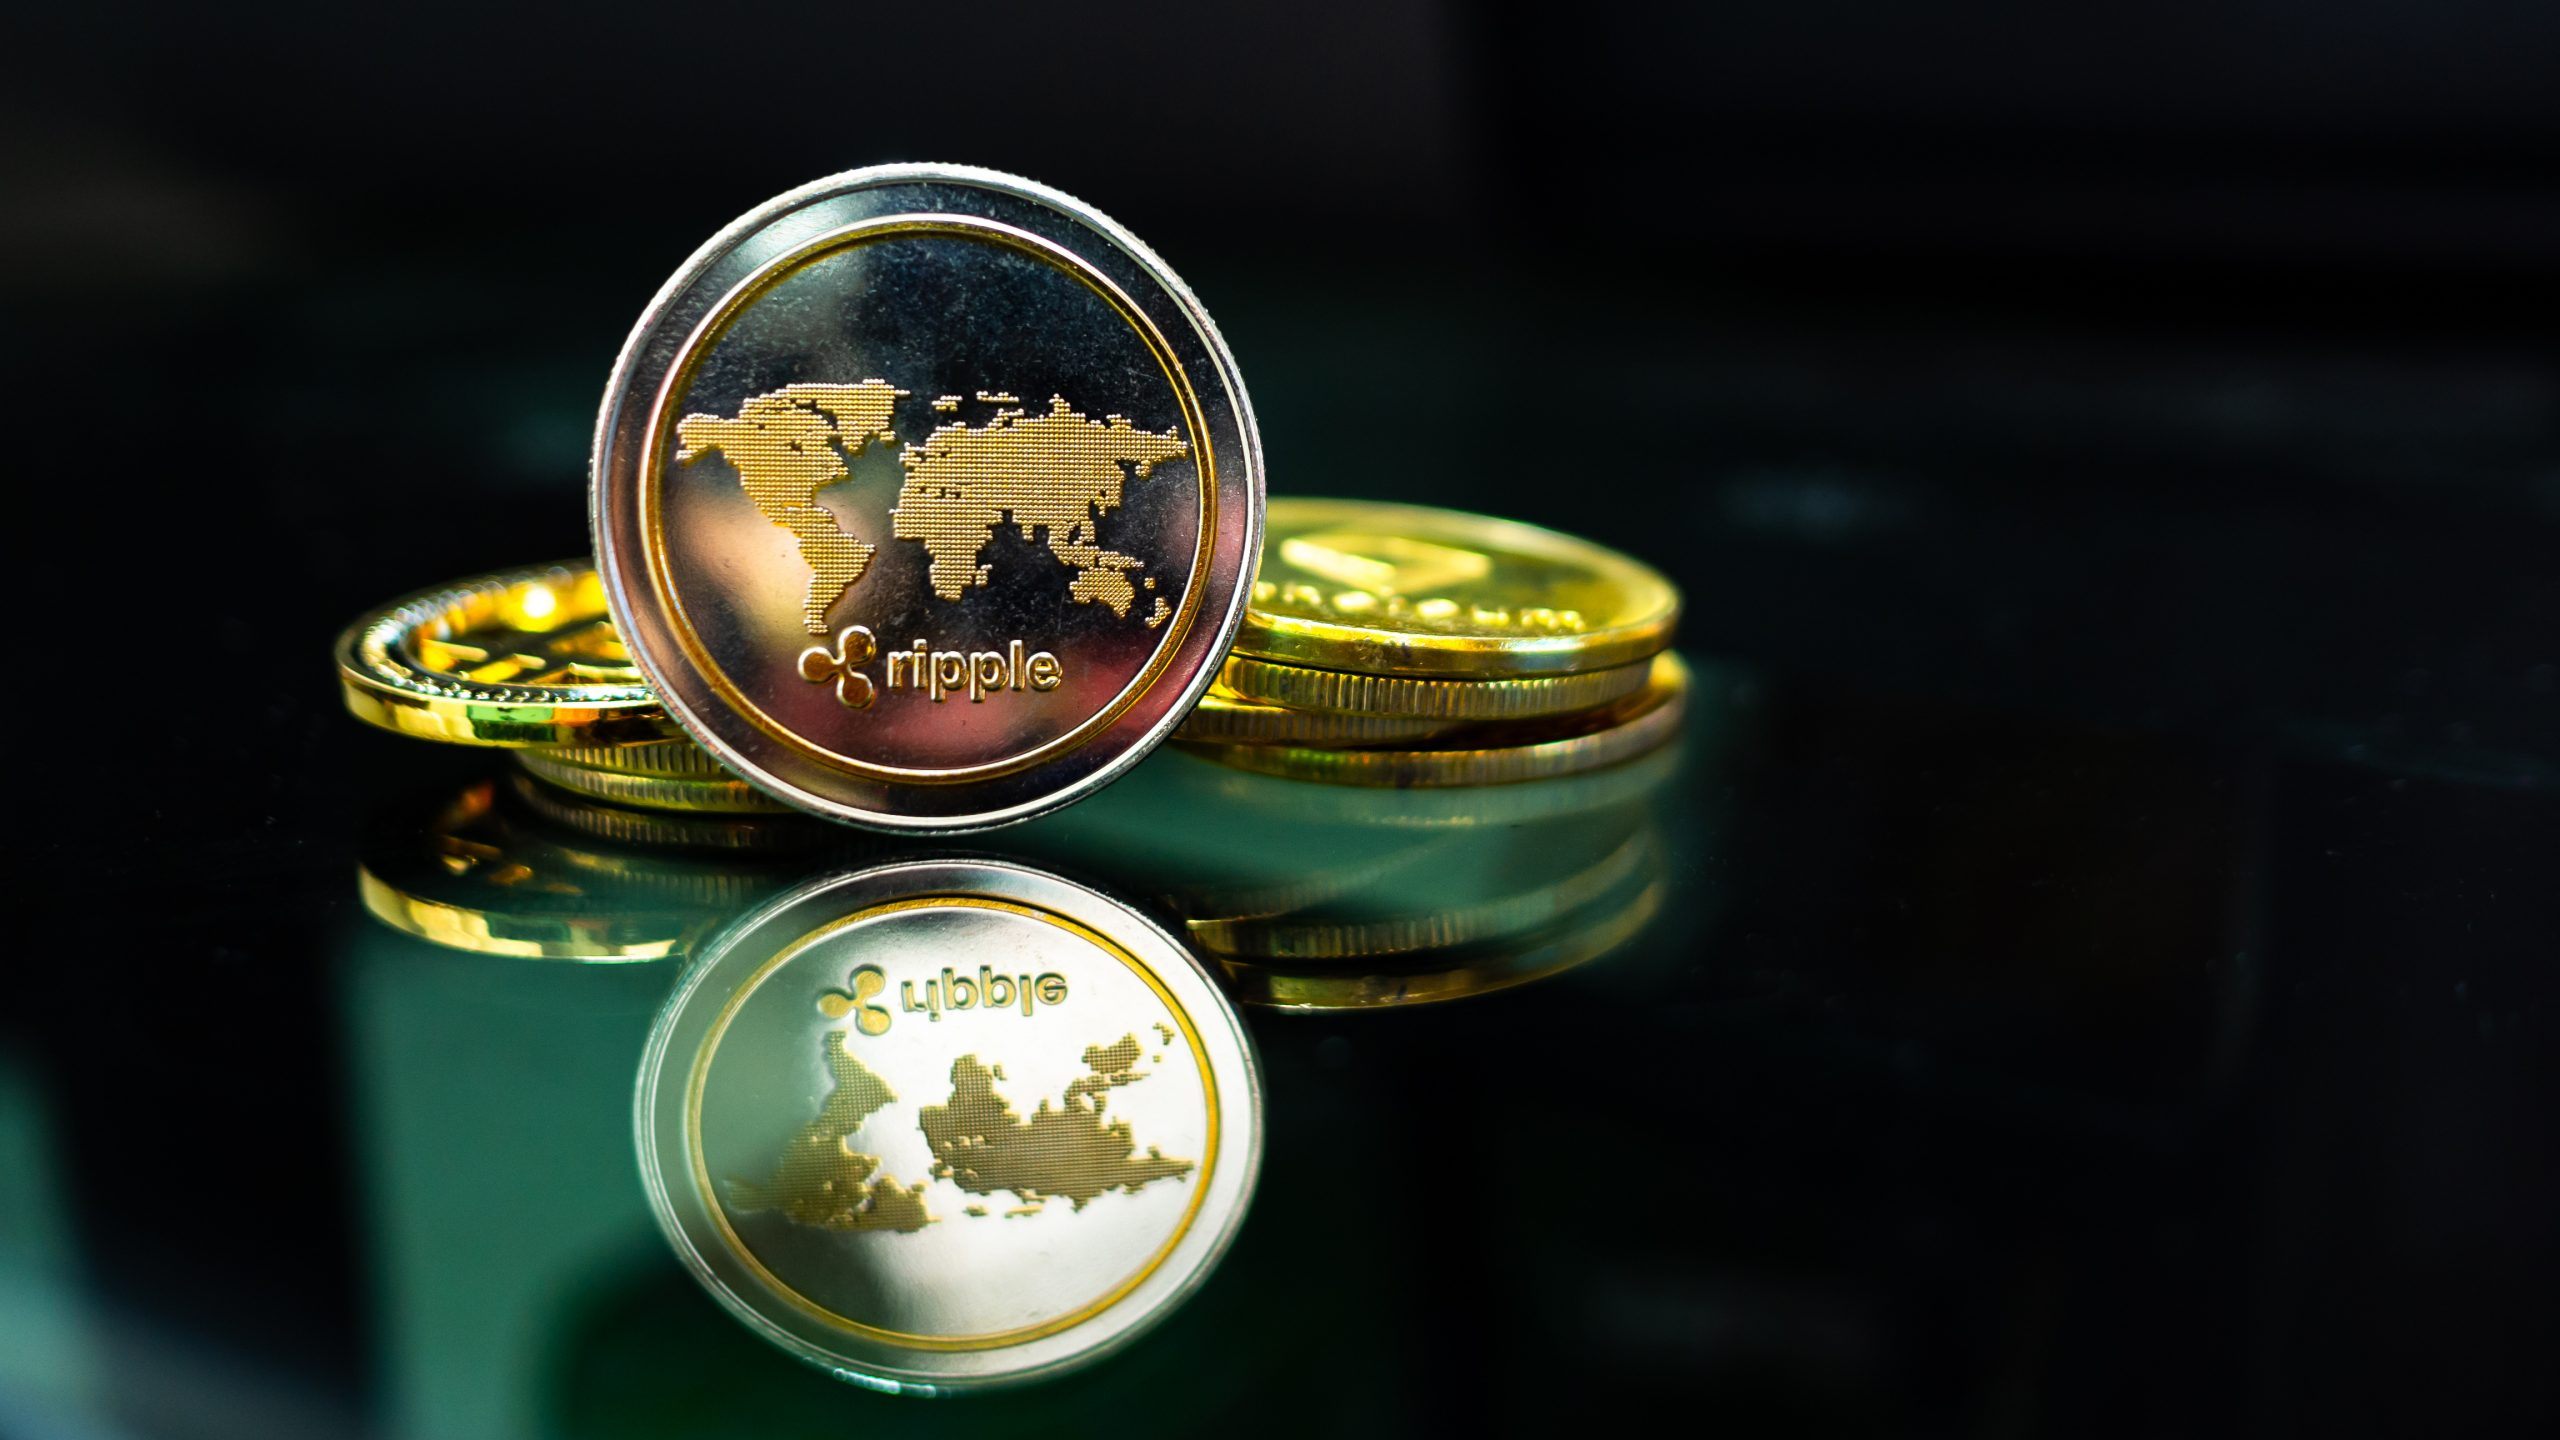 Ripple News and Bitcoin 12th birthday